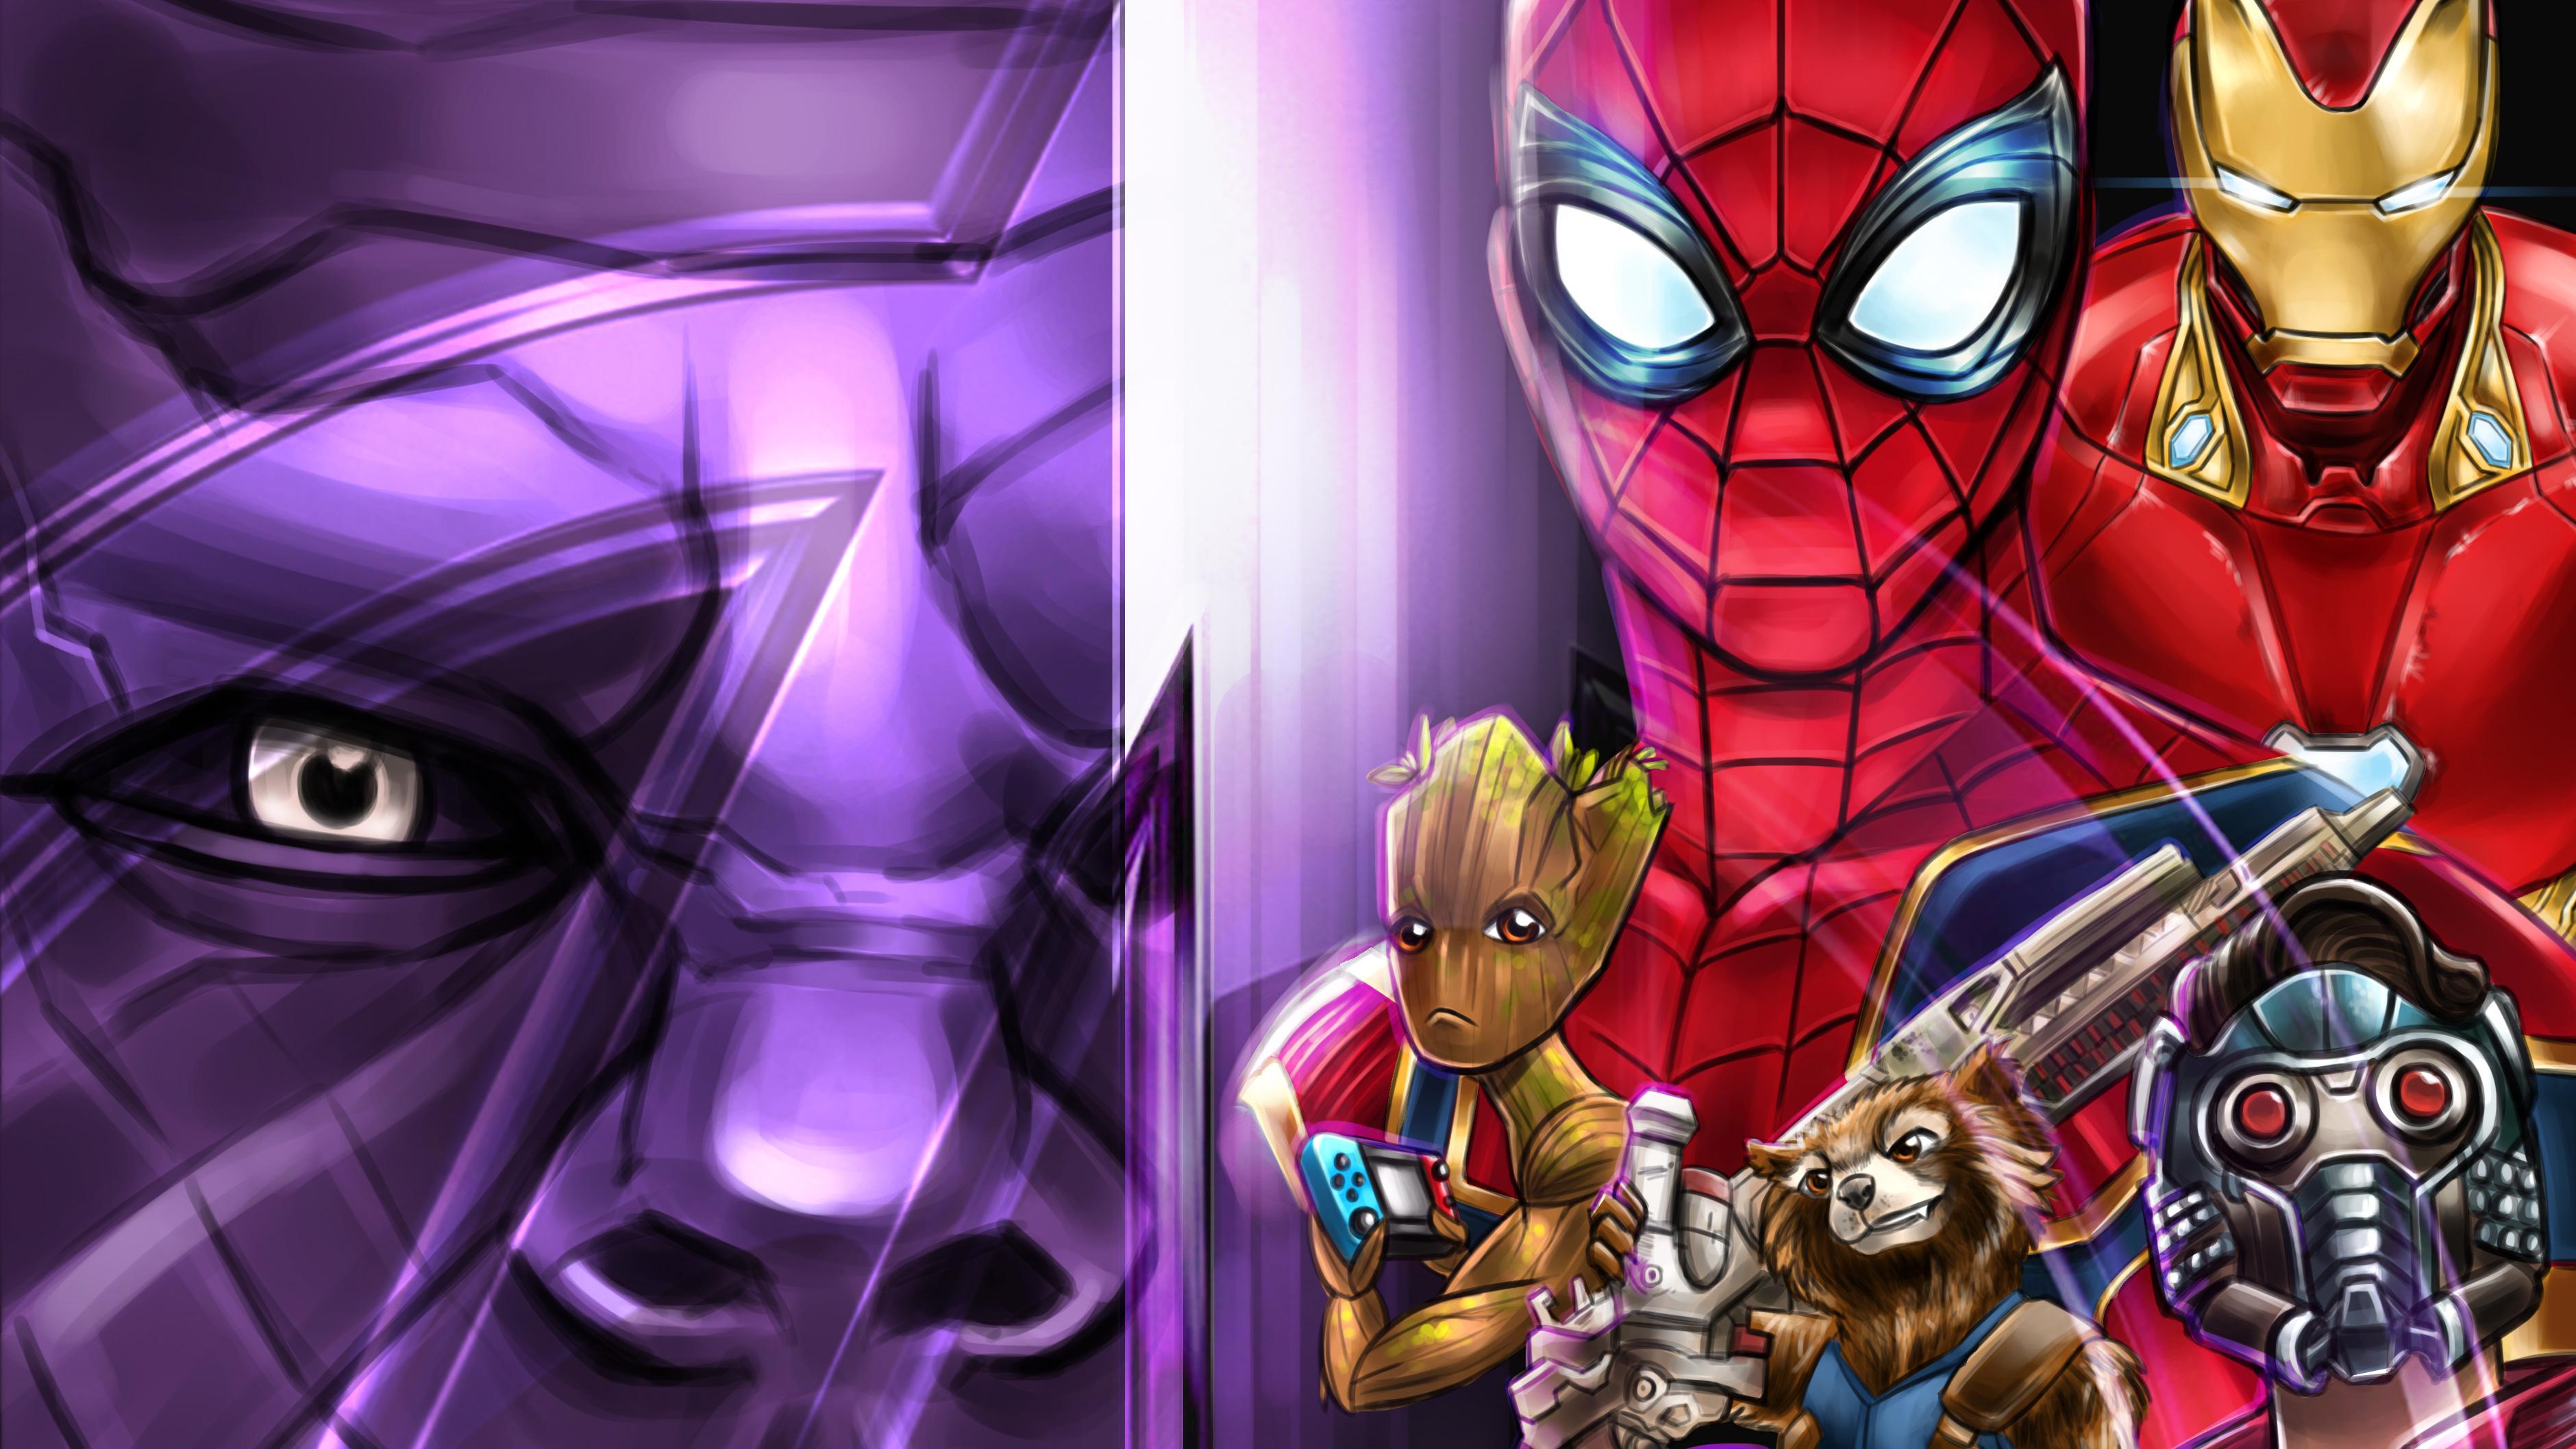 Officedetourismescaer Avengers Animated Wallpaper Android